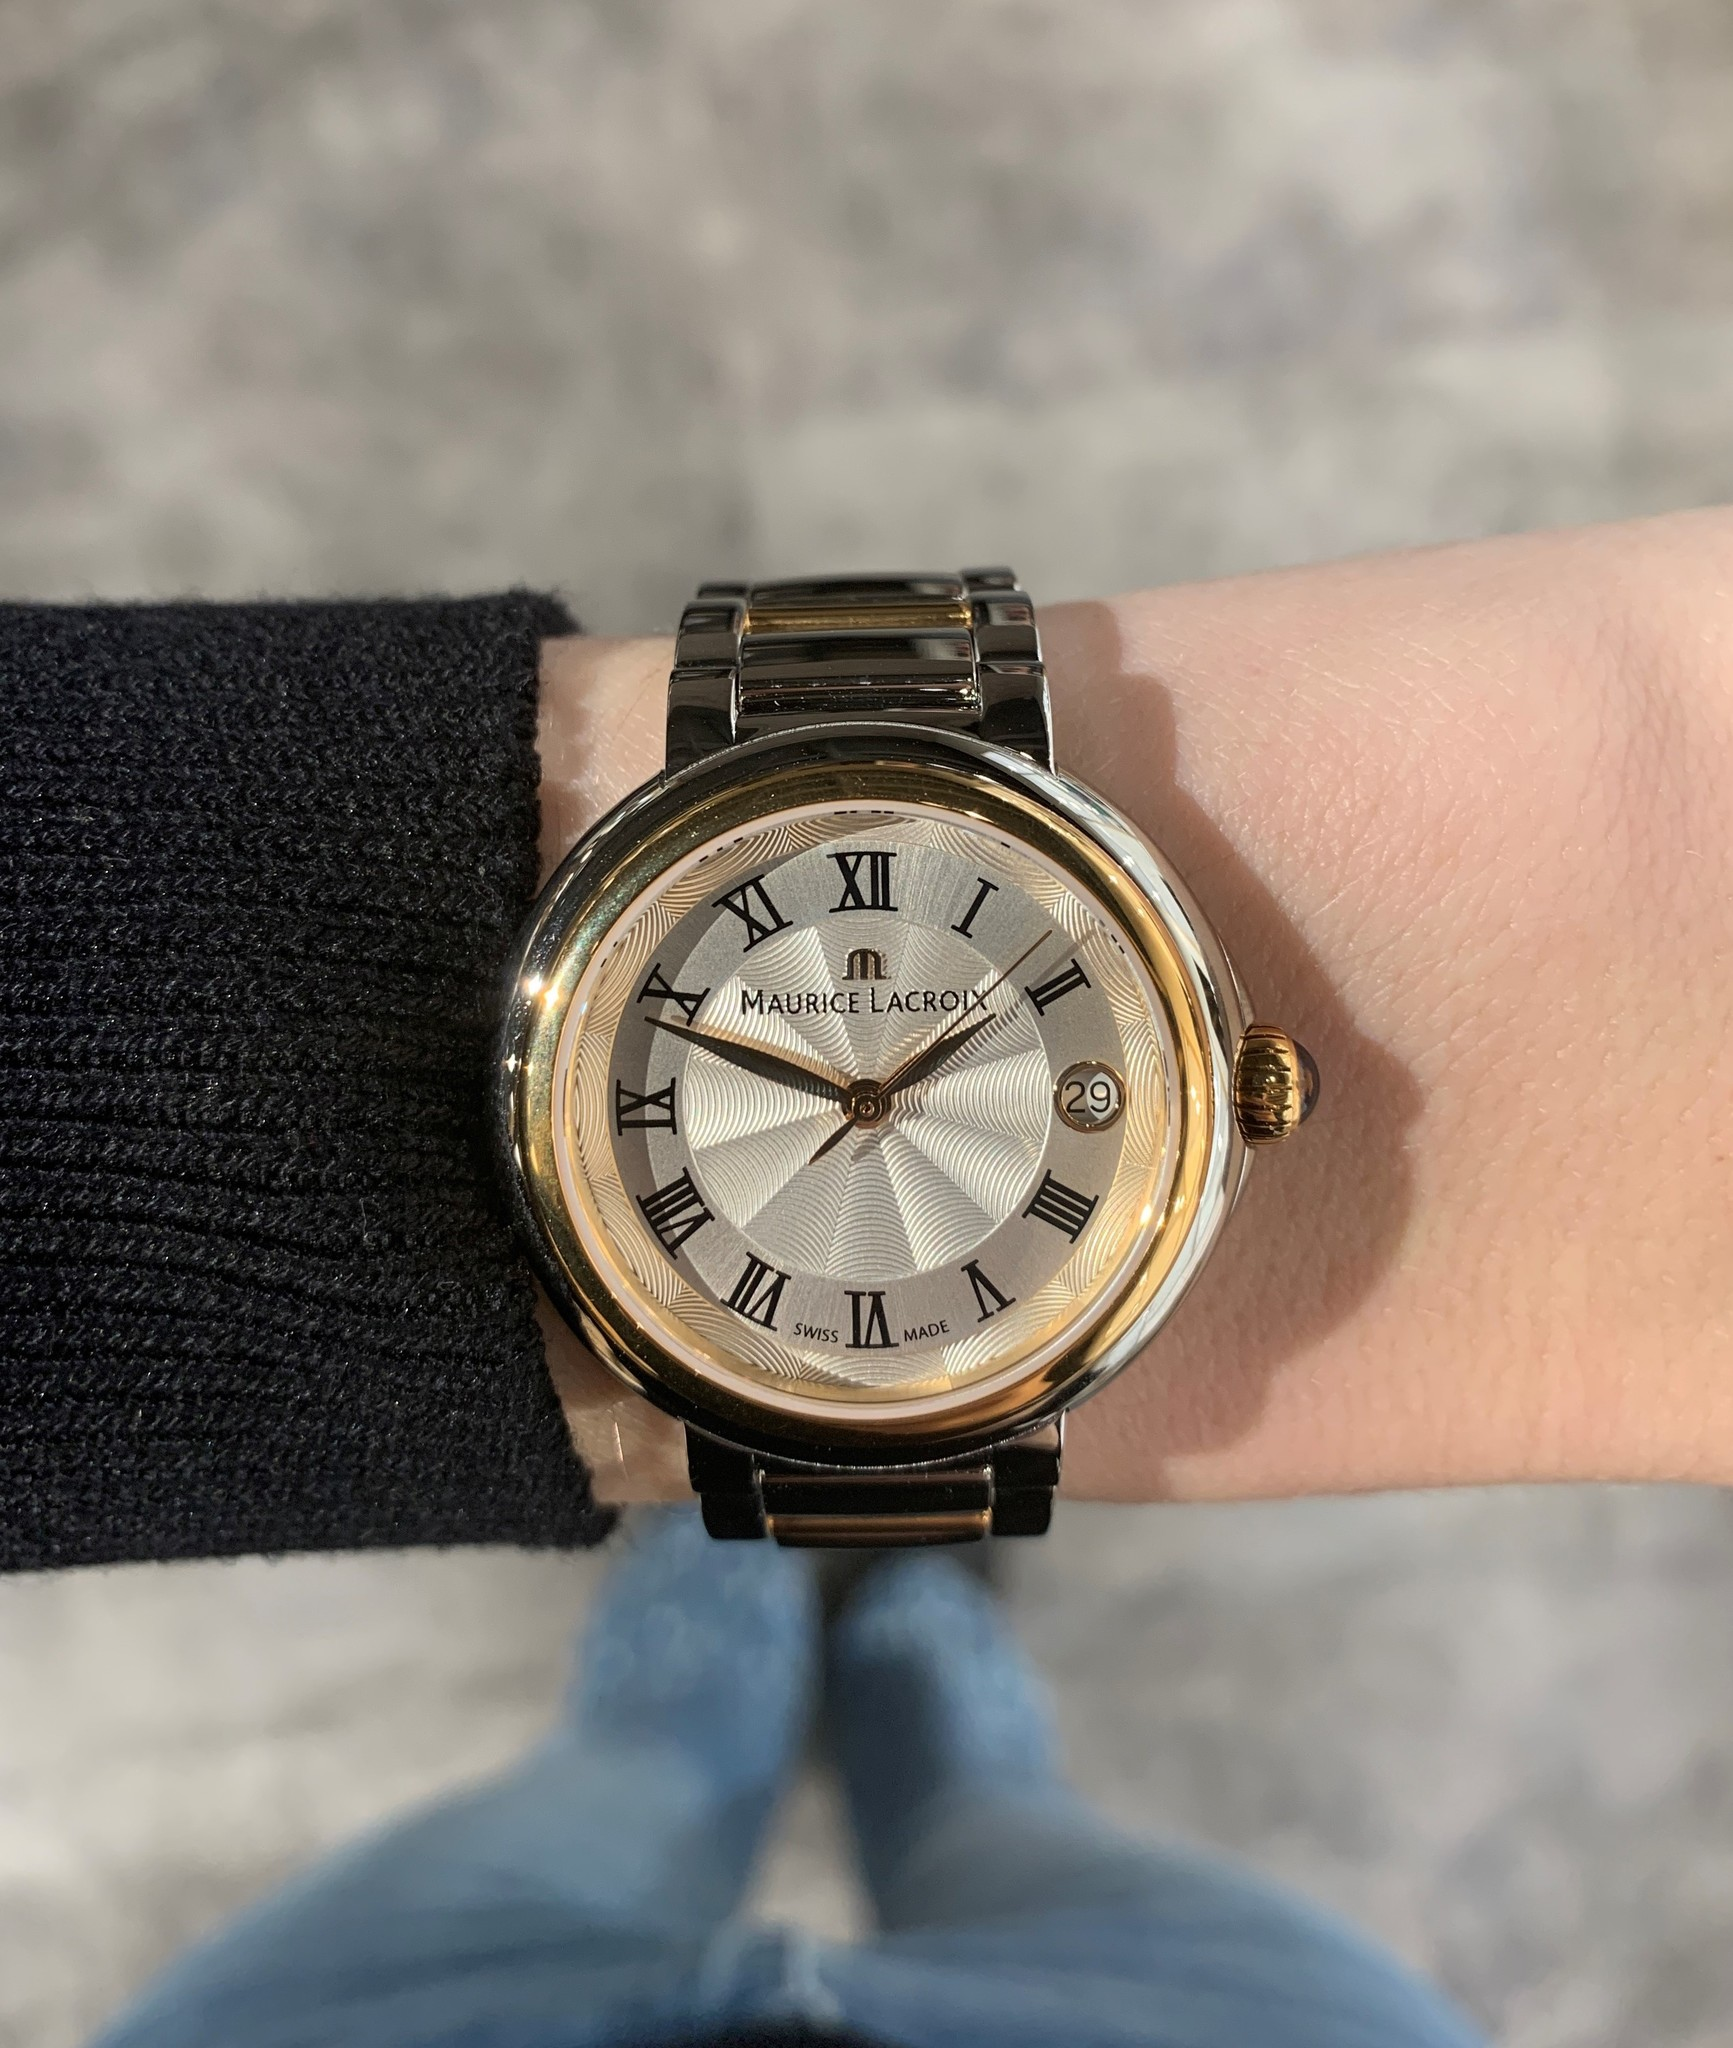 Maurice Lacroix Maurice Lacroix horloge Fiaba AX42974